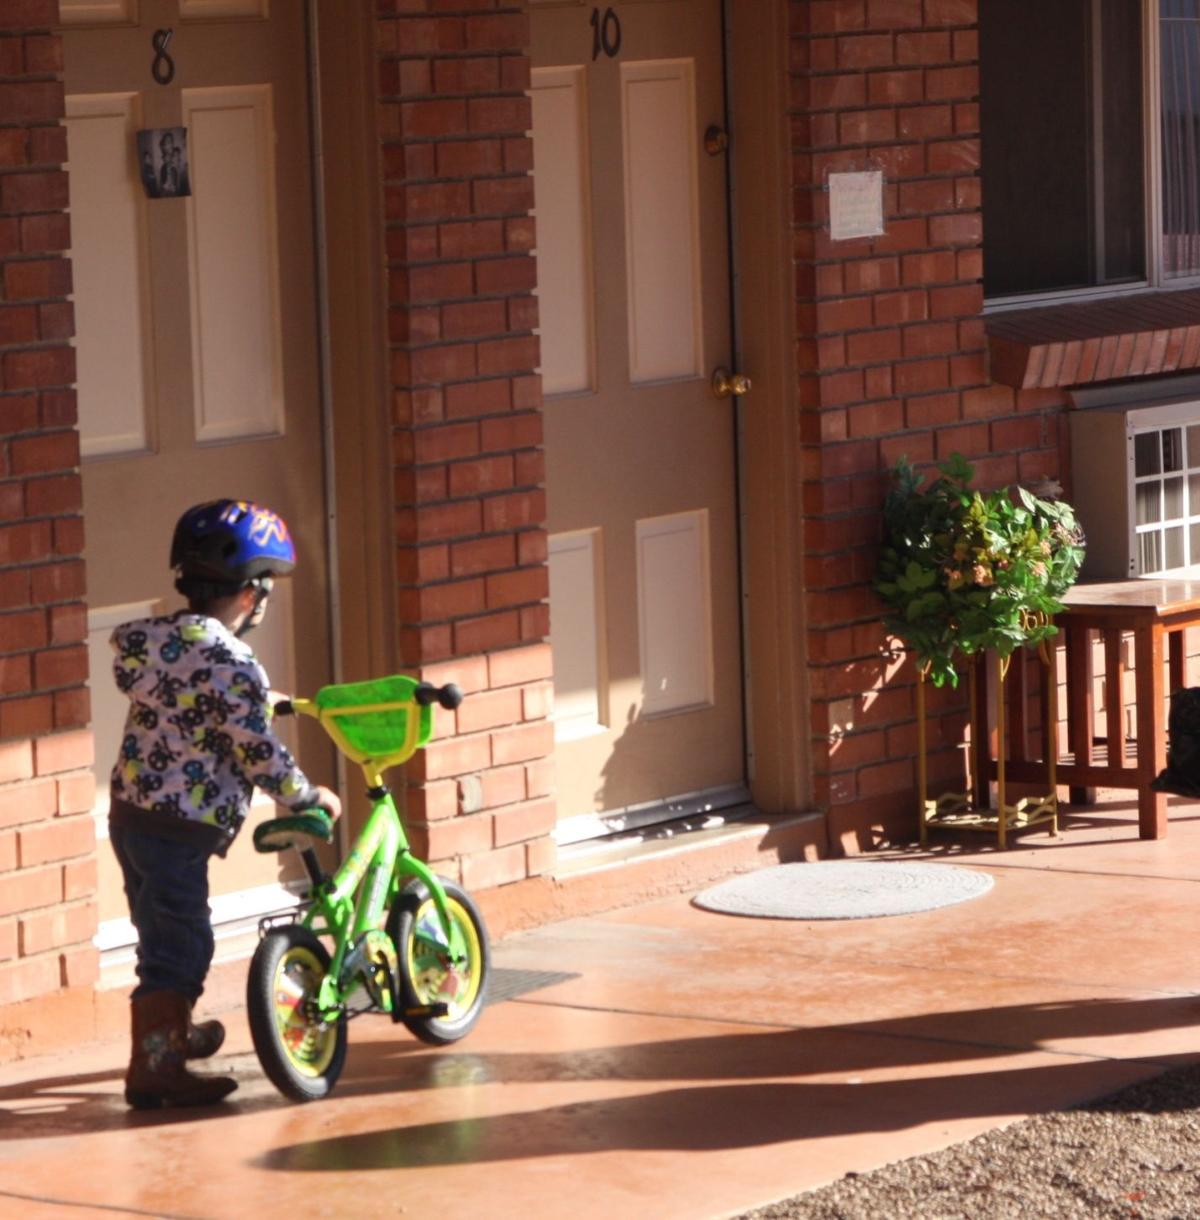 Zach and his bike